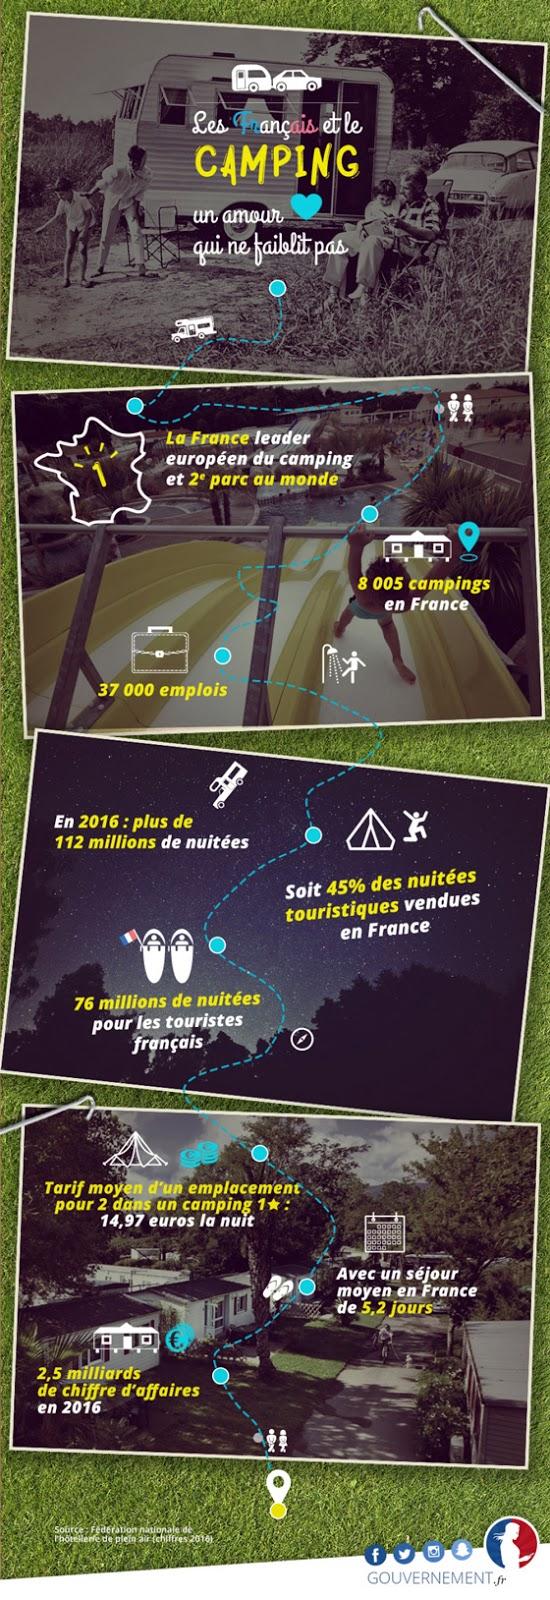 http://www.gouvernement.fr/sites/default/files/styles/plein-cadre/public/affiche/affiche/2017/07/camping-32.jpg?itok=EUjTl3k8